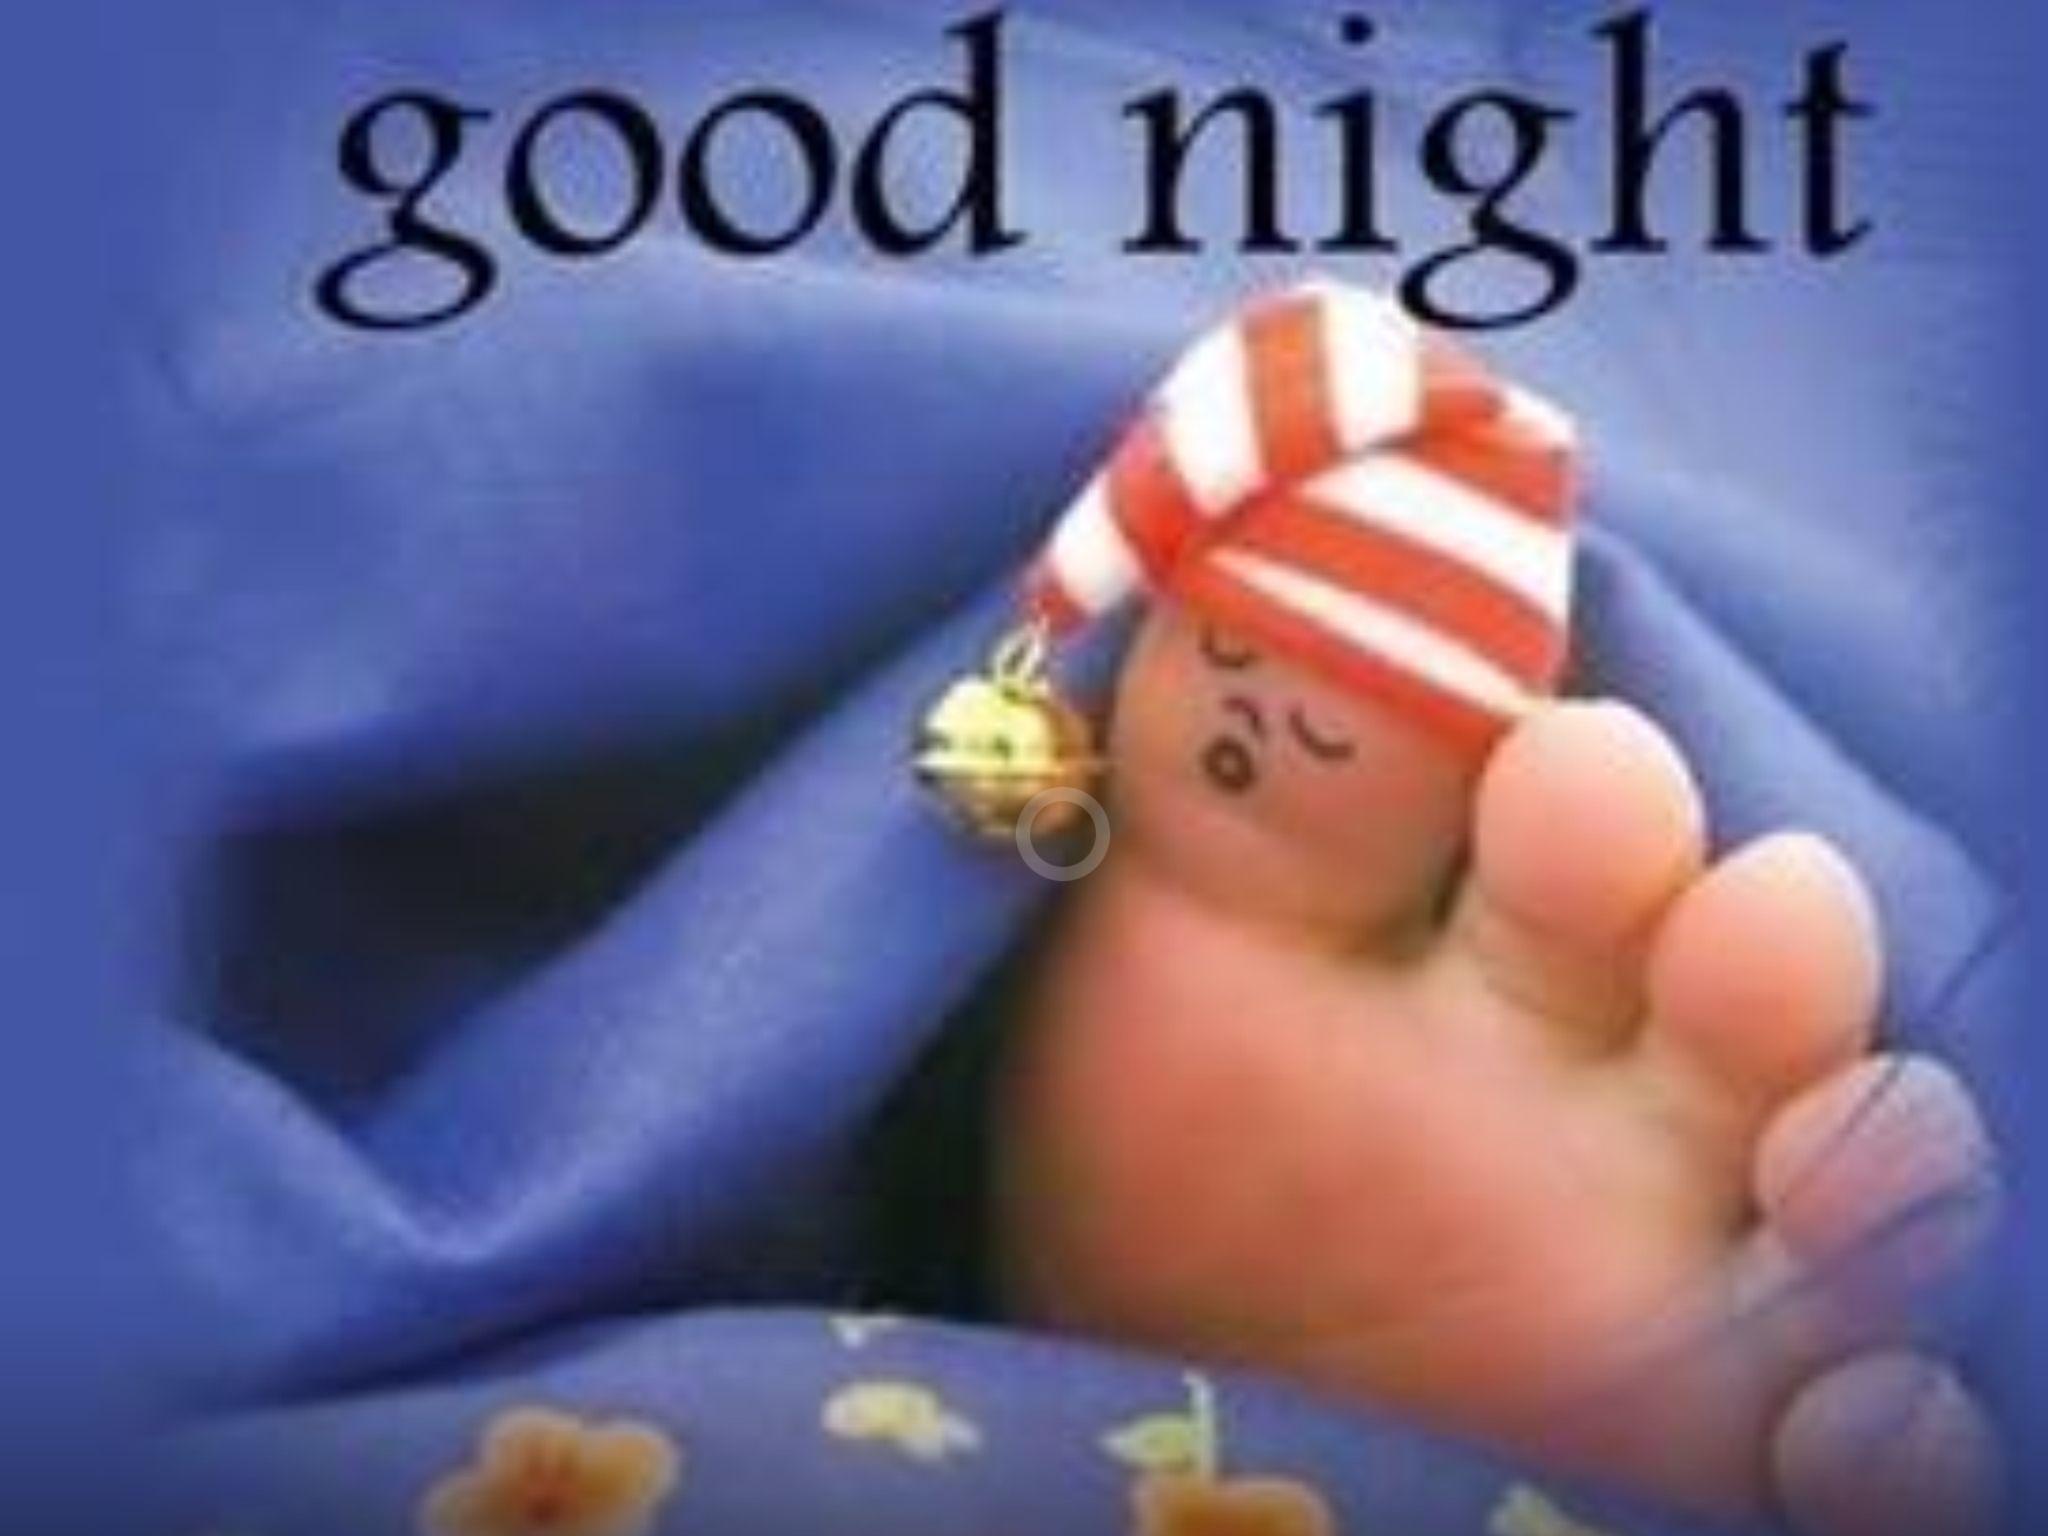 Pin By Soutan Takeda On Good Night Good Night Funny Good Night Friends Good Night Sweet Dreams